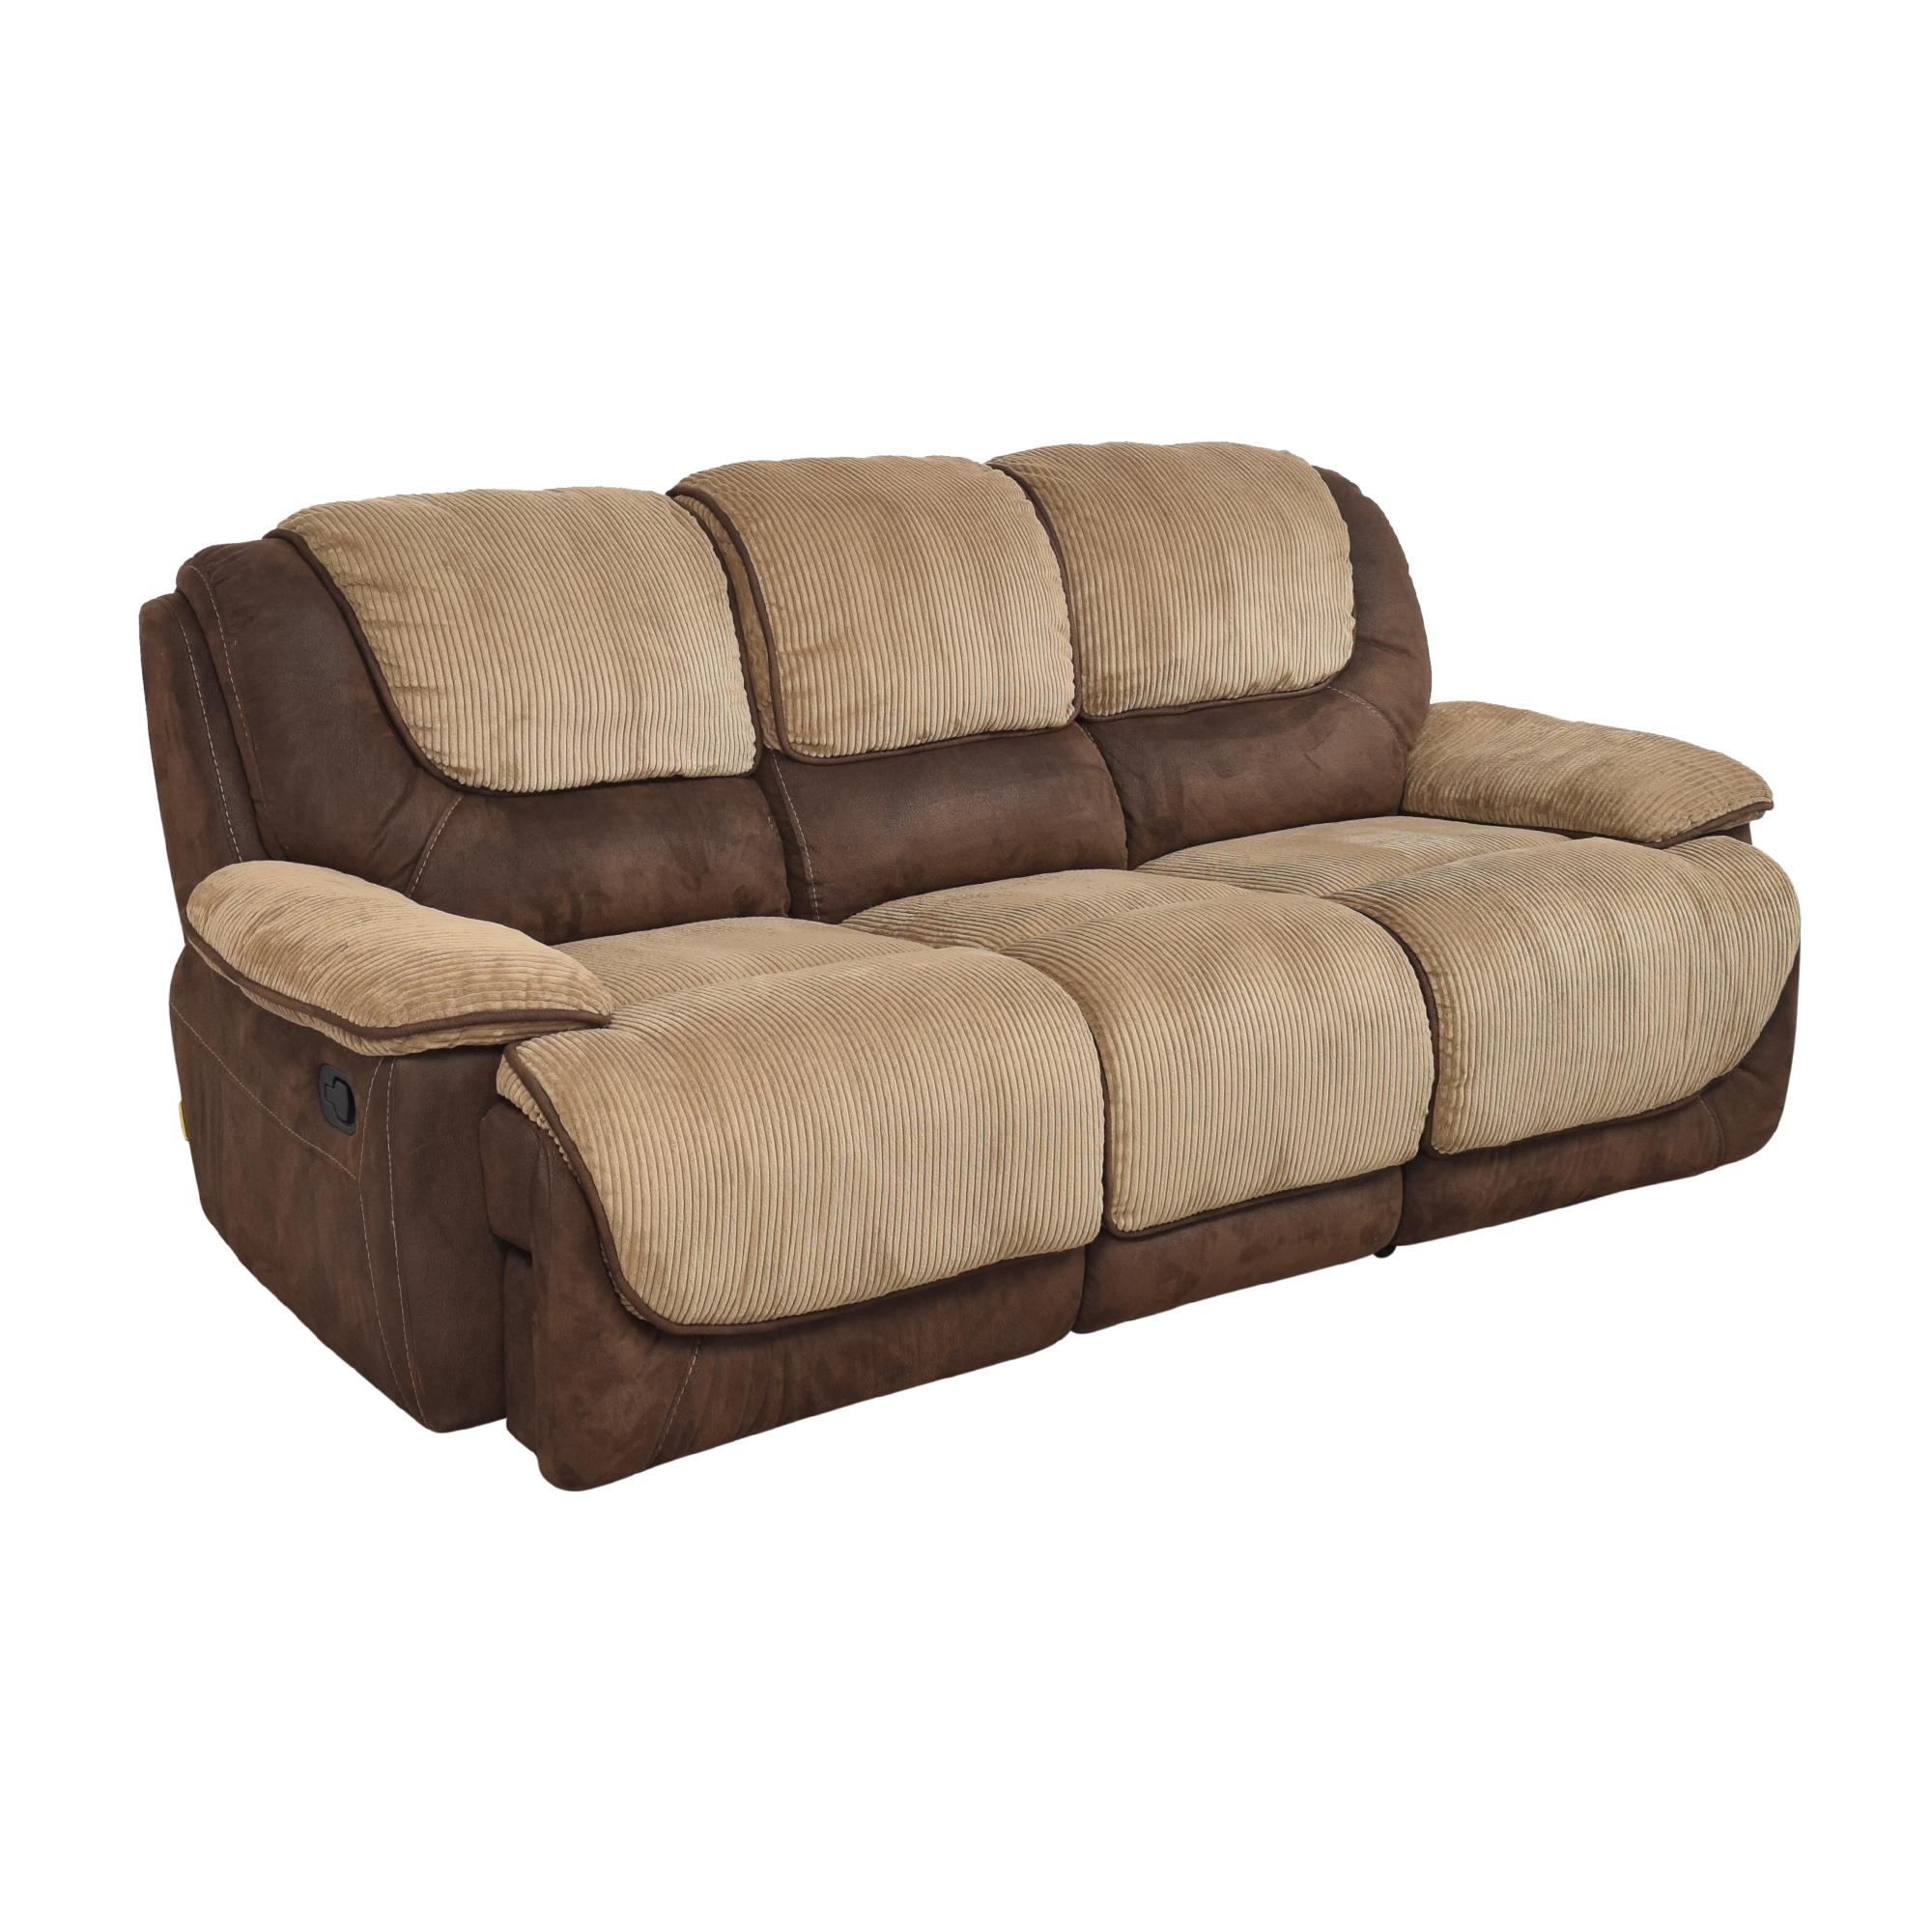 Two Tone Reclining Sofa sale